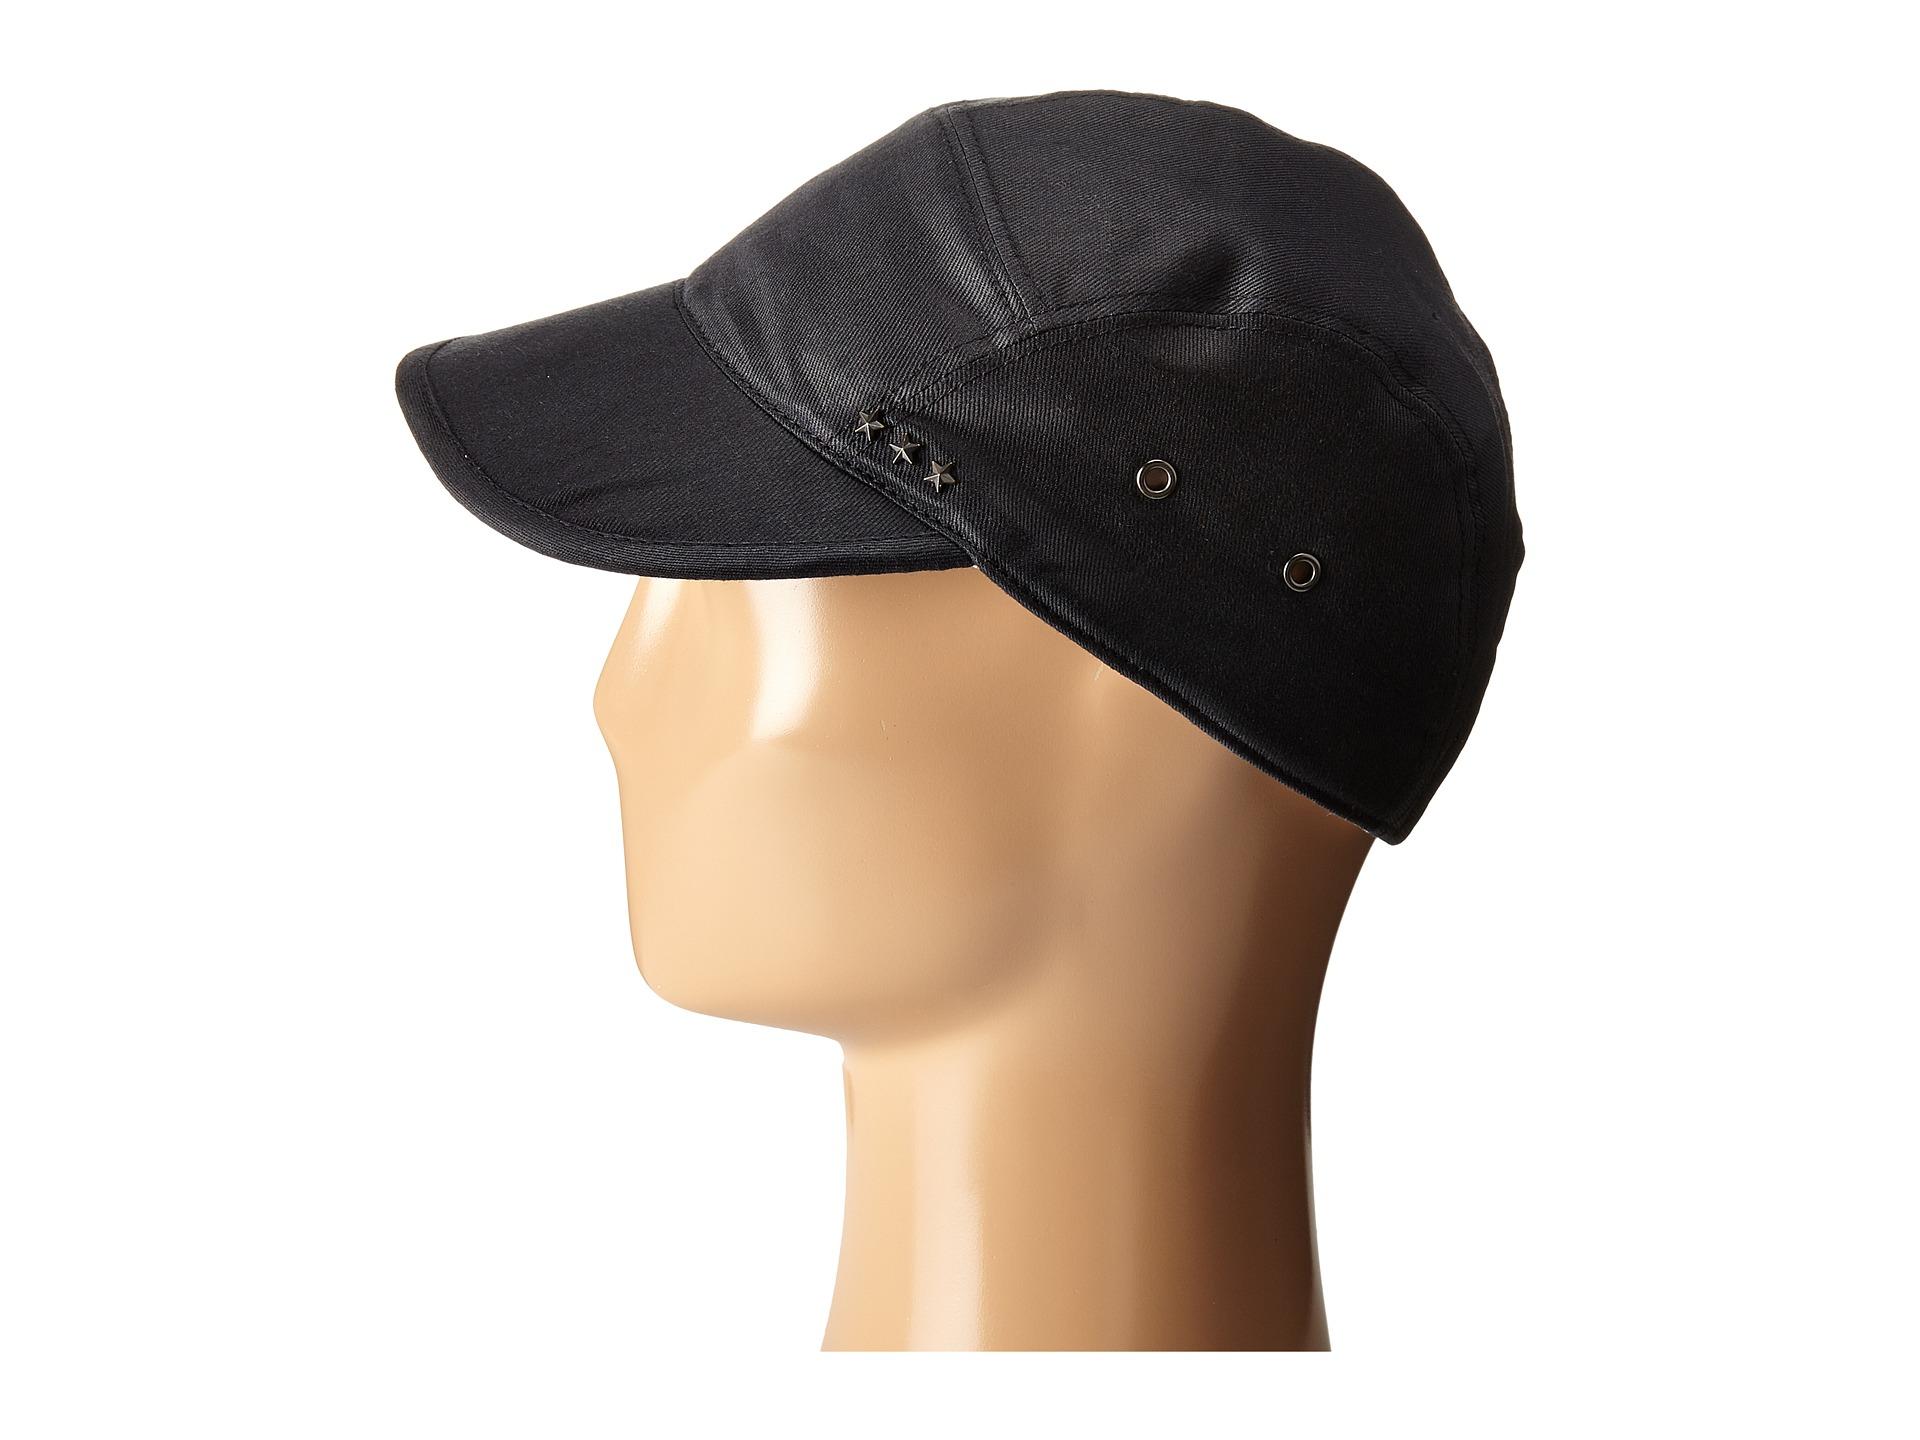 Lyst John Varvatos Baseball Hat In Black For Men 57a5f658707f